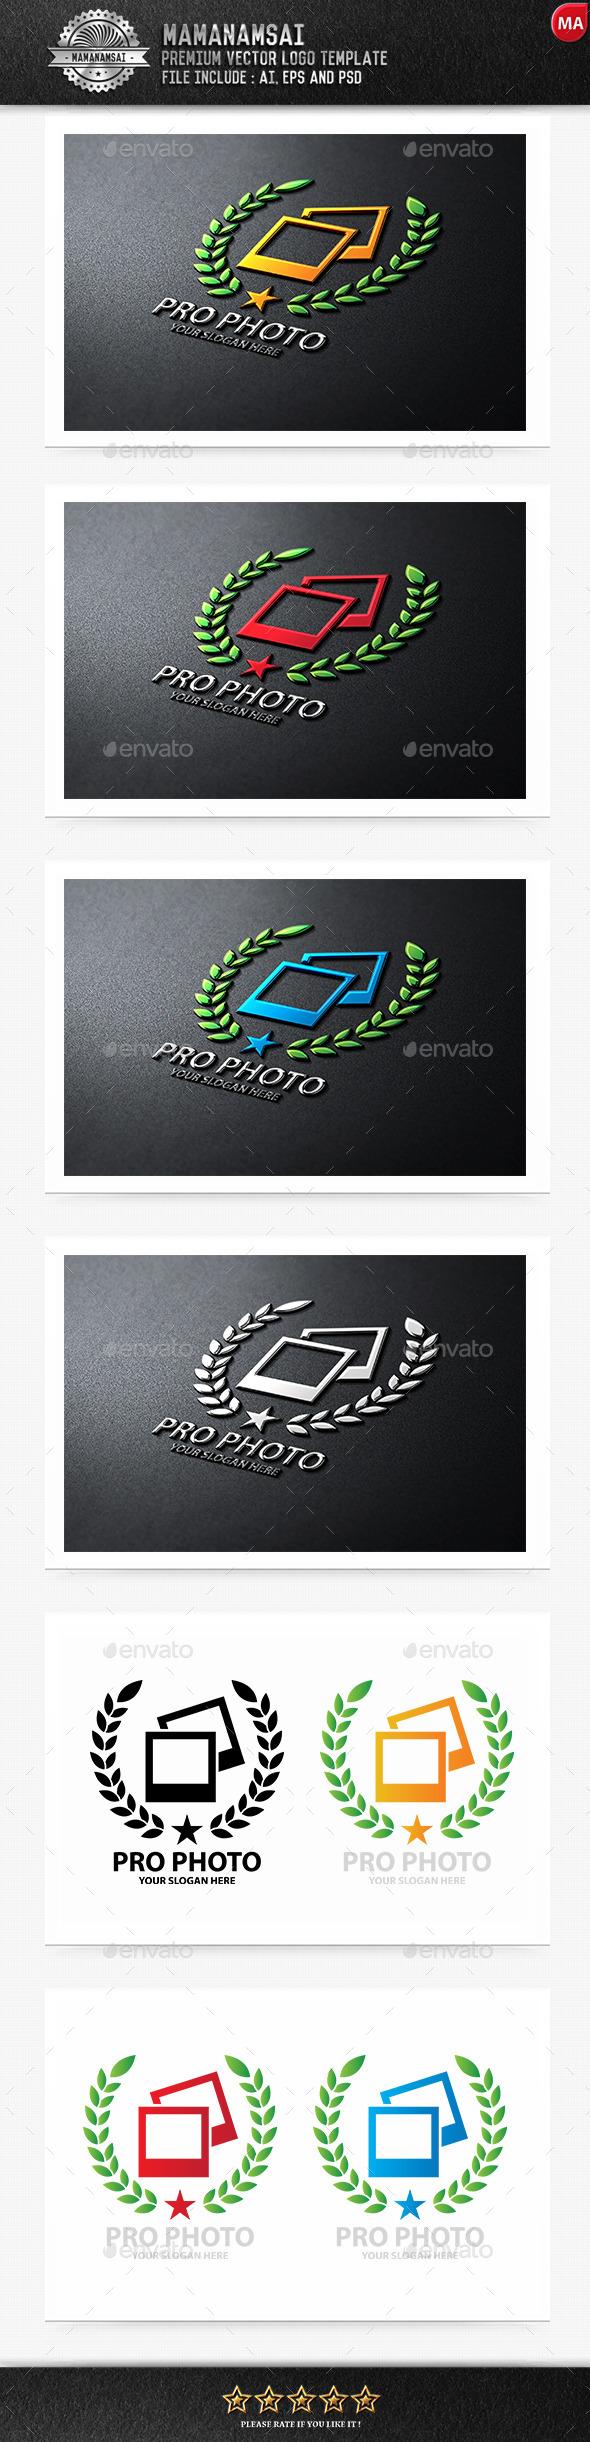 Pro Photo Logo - Logo Templates